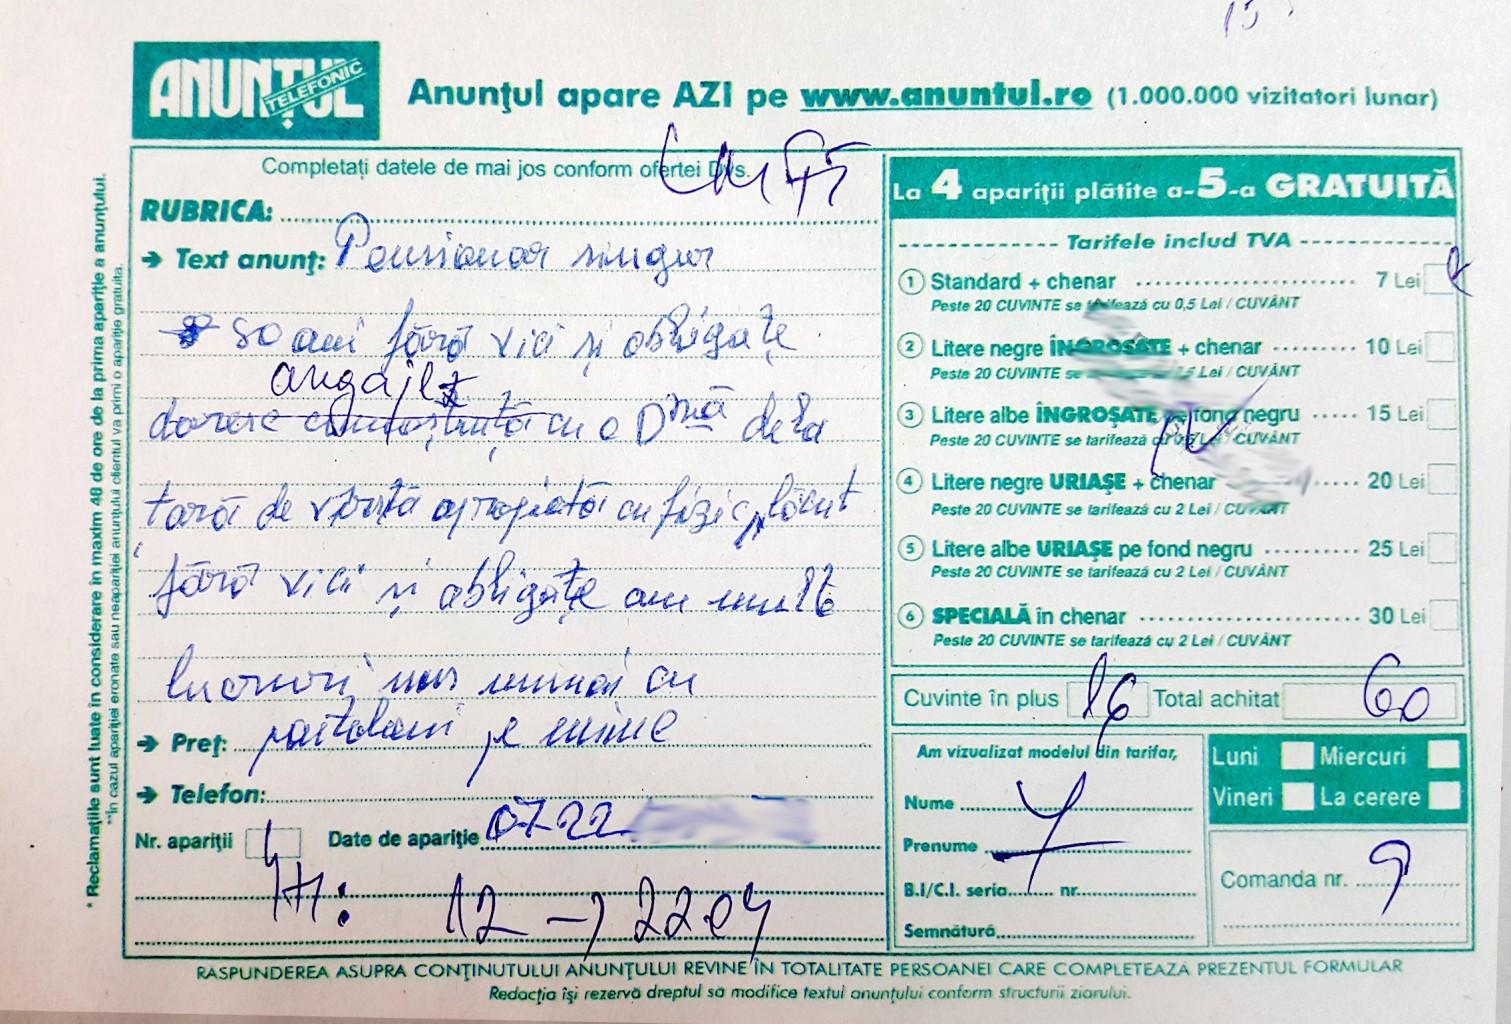 Doamna In Varsta Caut Baiat Tanar Debrecen Anunturi matrimoniale in deta, căutare